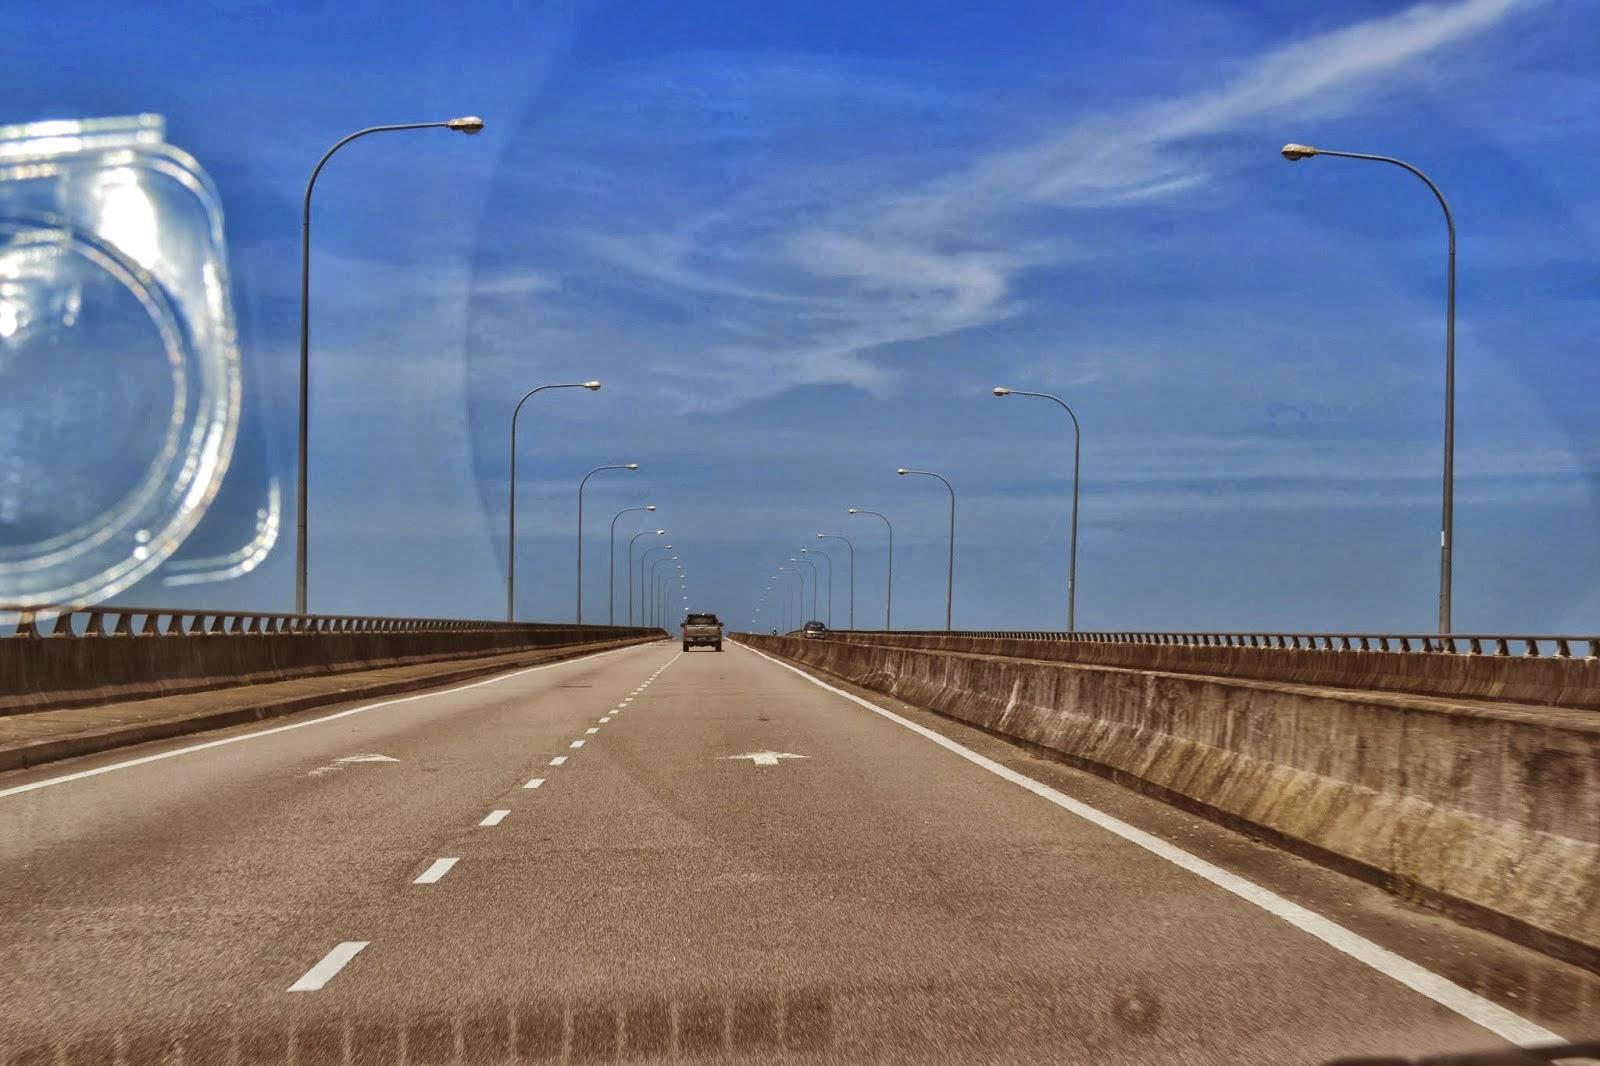 Asean Bridge Kuala belait